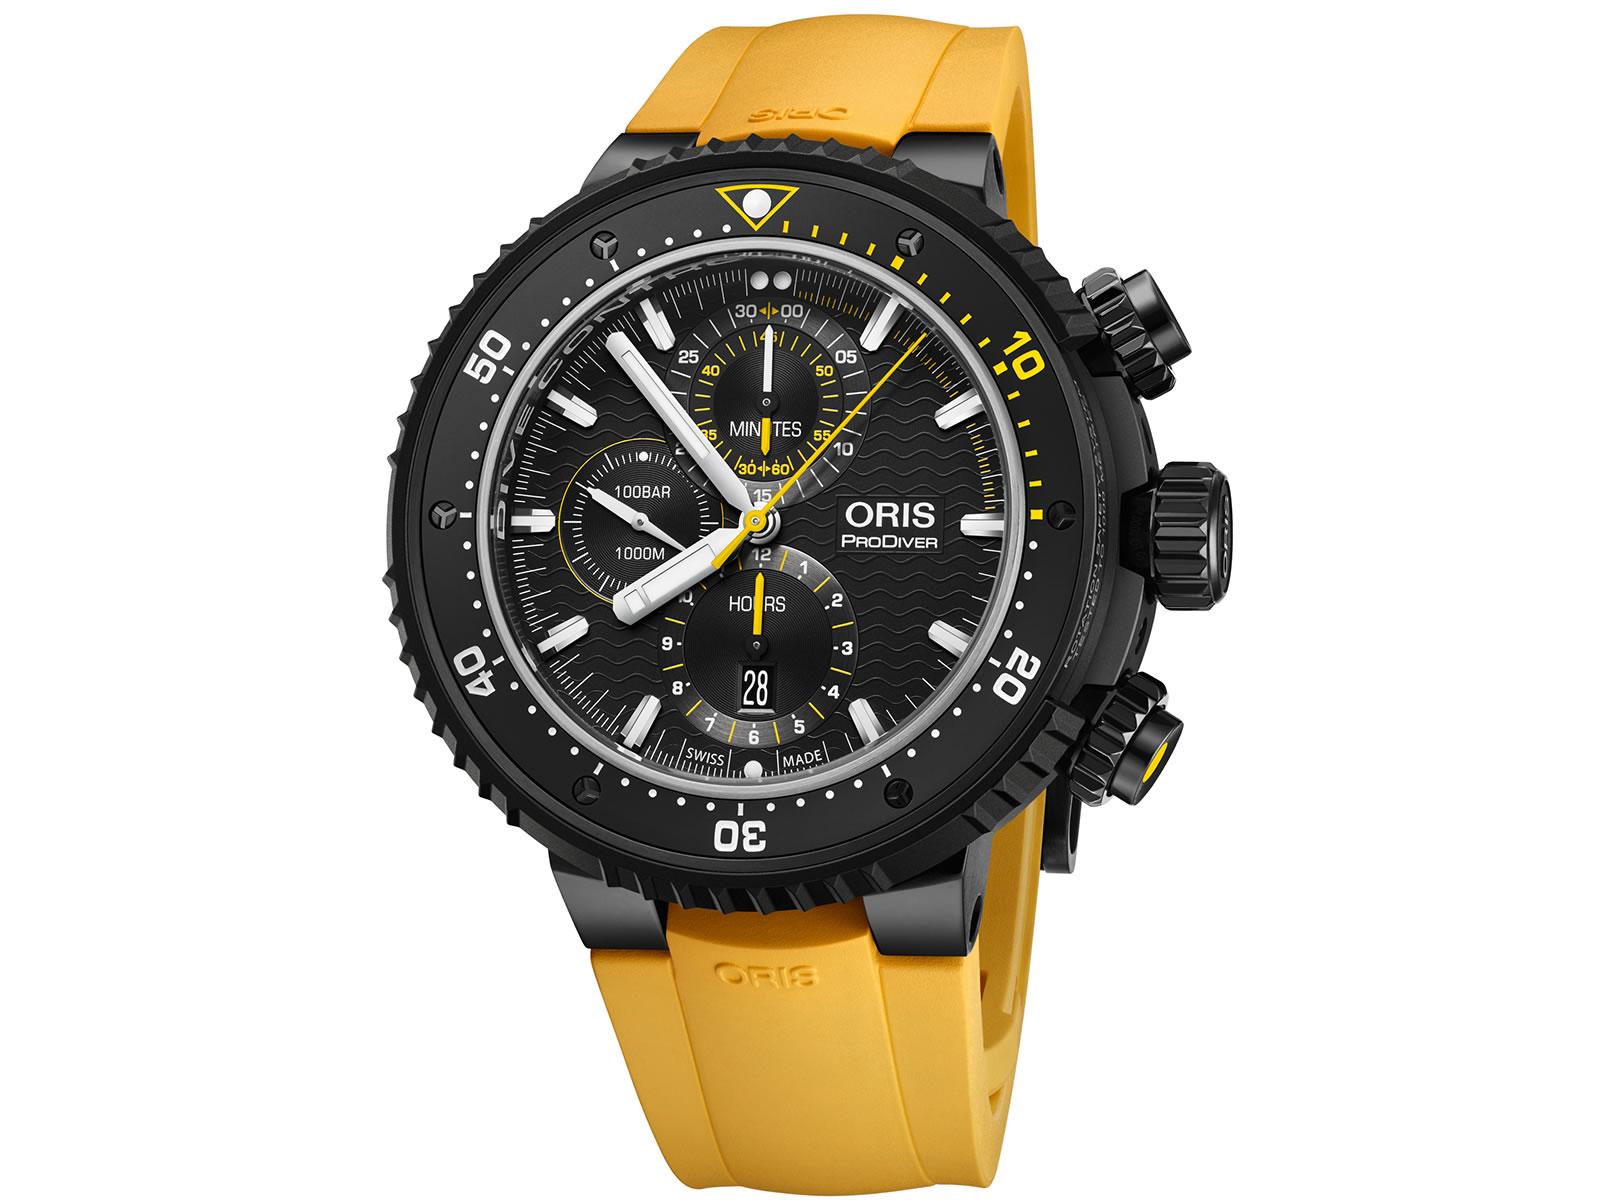 01-774-7727-7784-set-oris-prodiver-dive-control-chronograph-4-.jpg